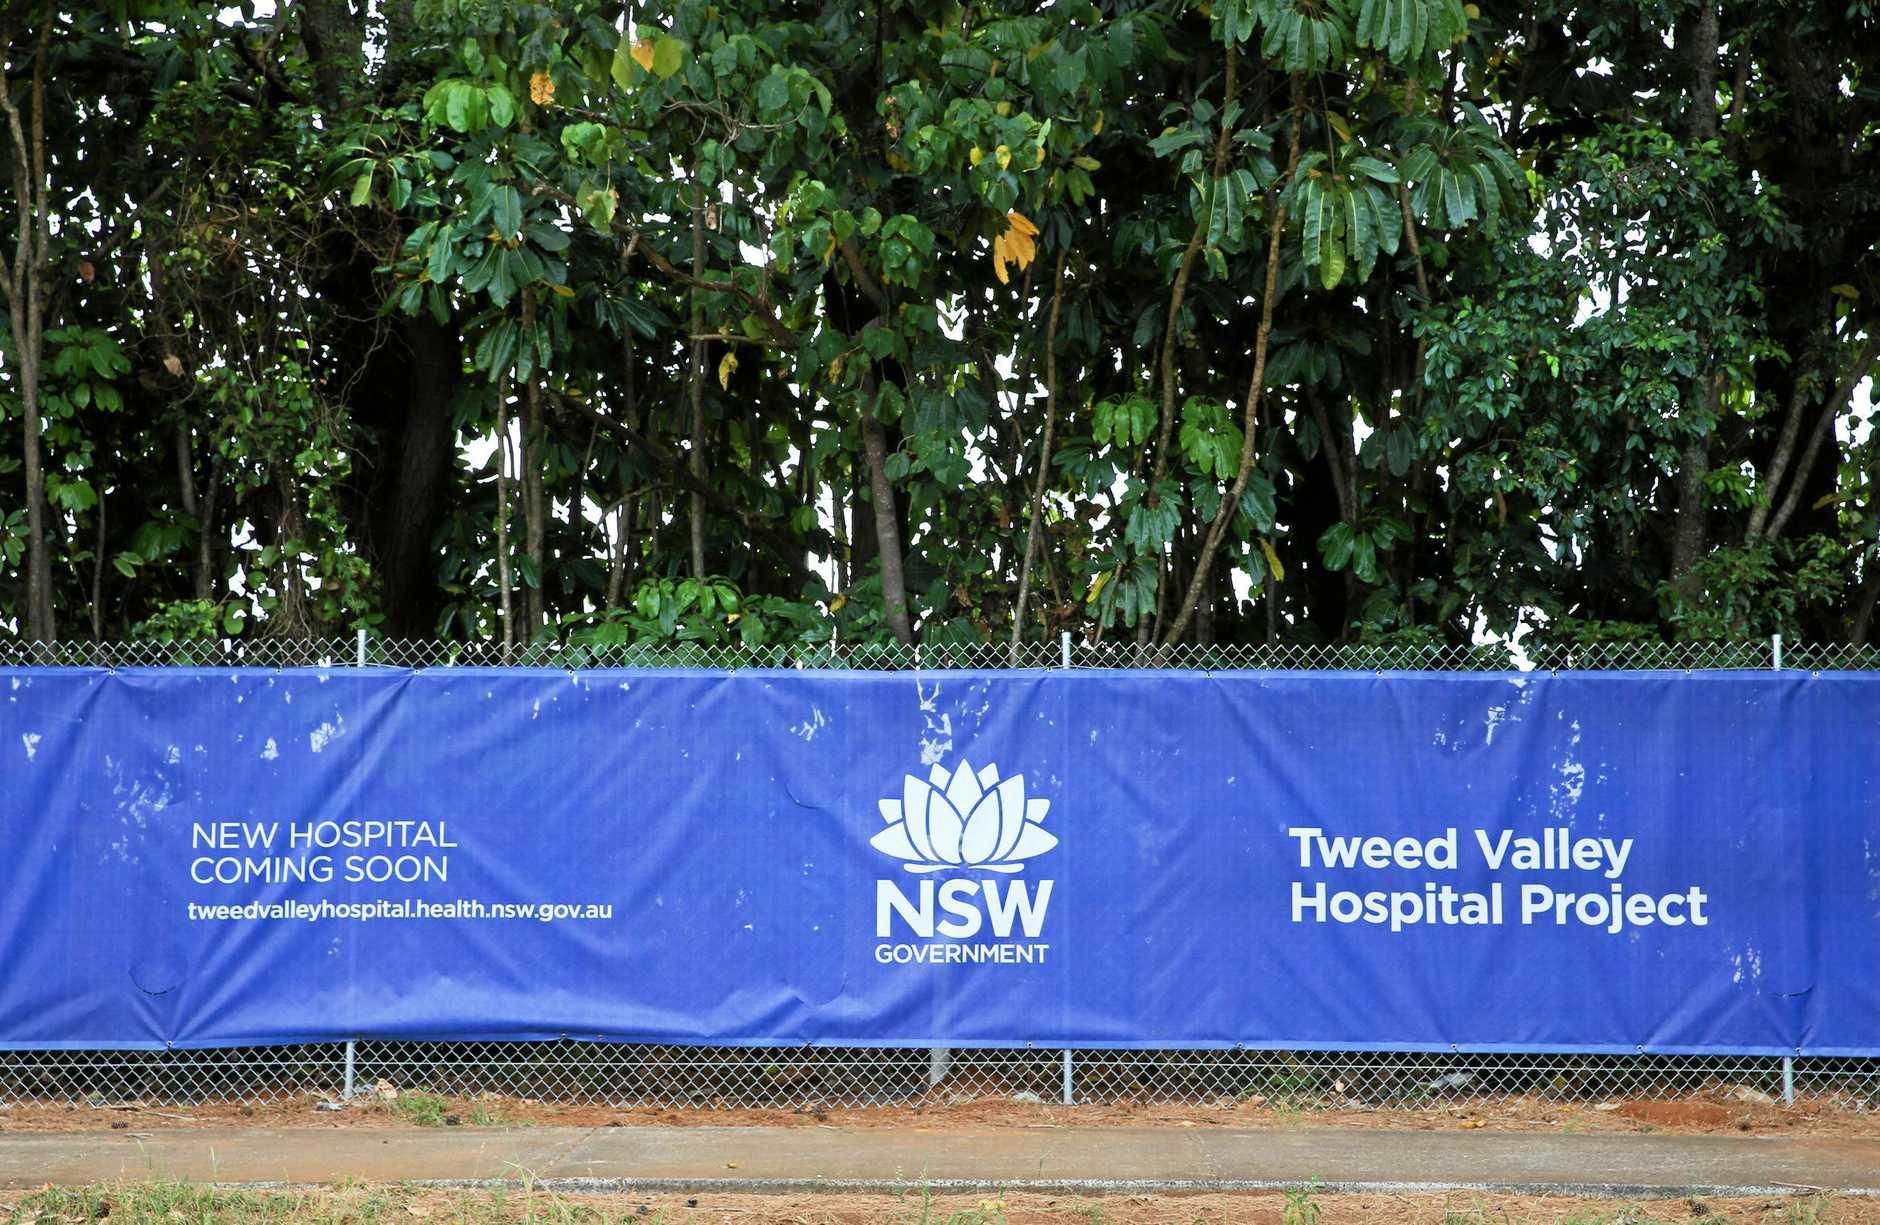 The new Tweed Valley Hospital site at Cudgen.